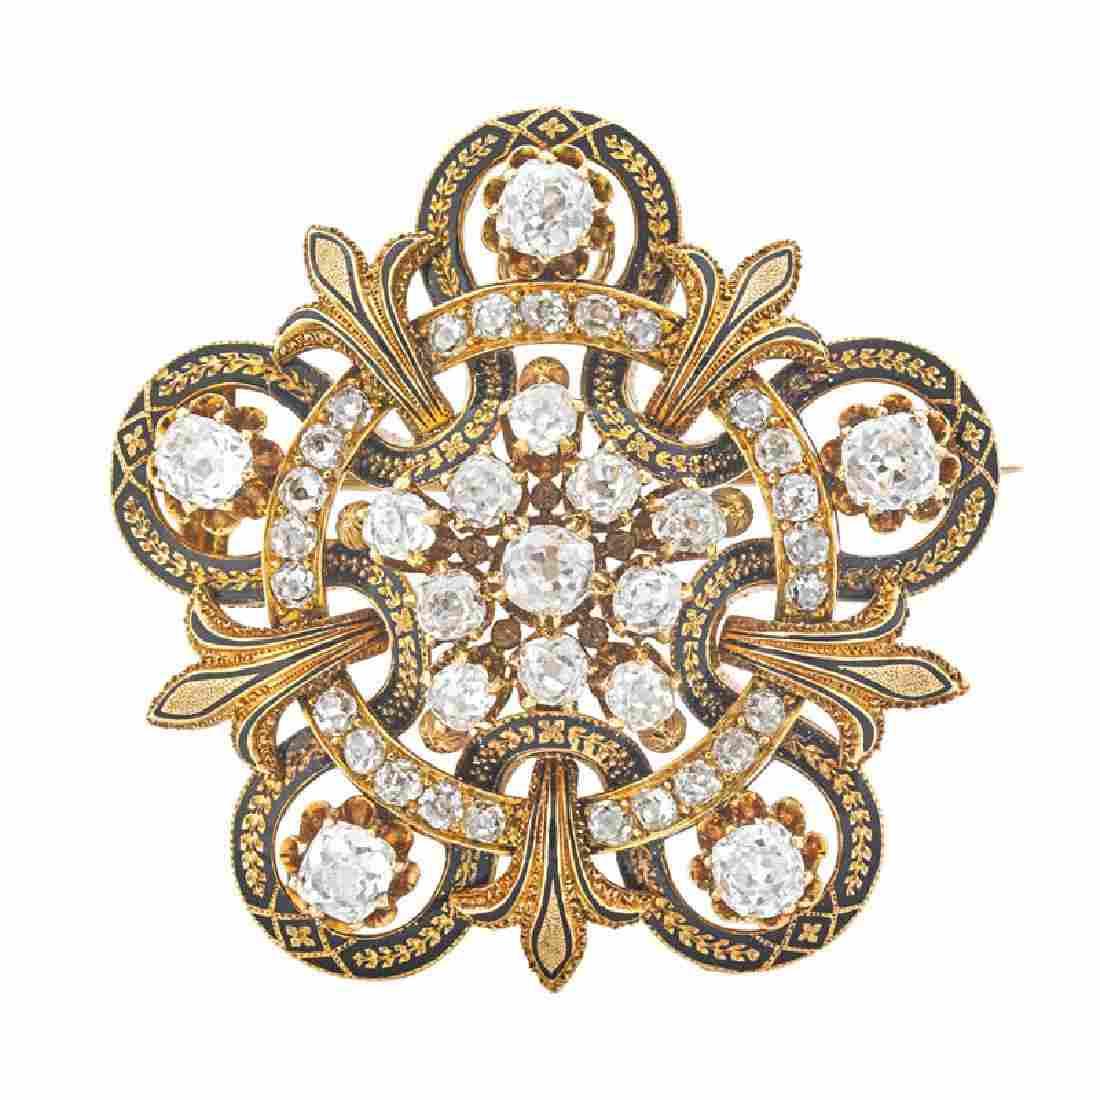 VICTORIAN DIAMOND & ENAMELED YELLOW GOLD PENDANT BROOCH